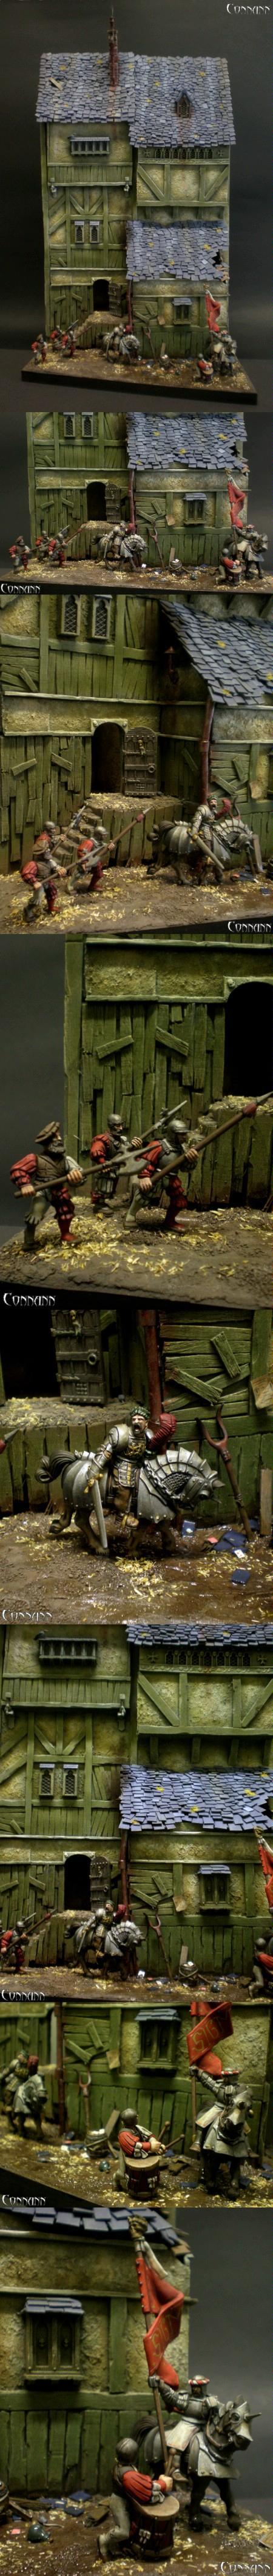 28mm, Awesomeness, Diorama, Warhammer Fantasy